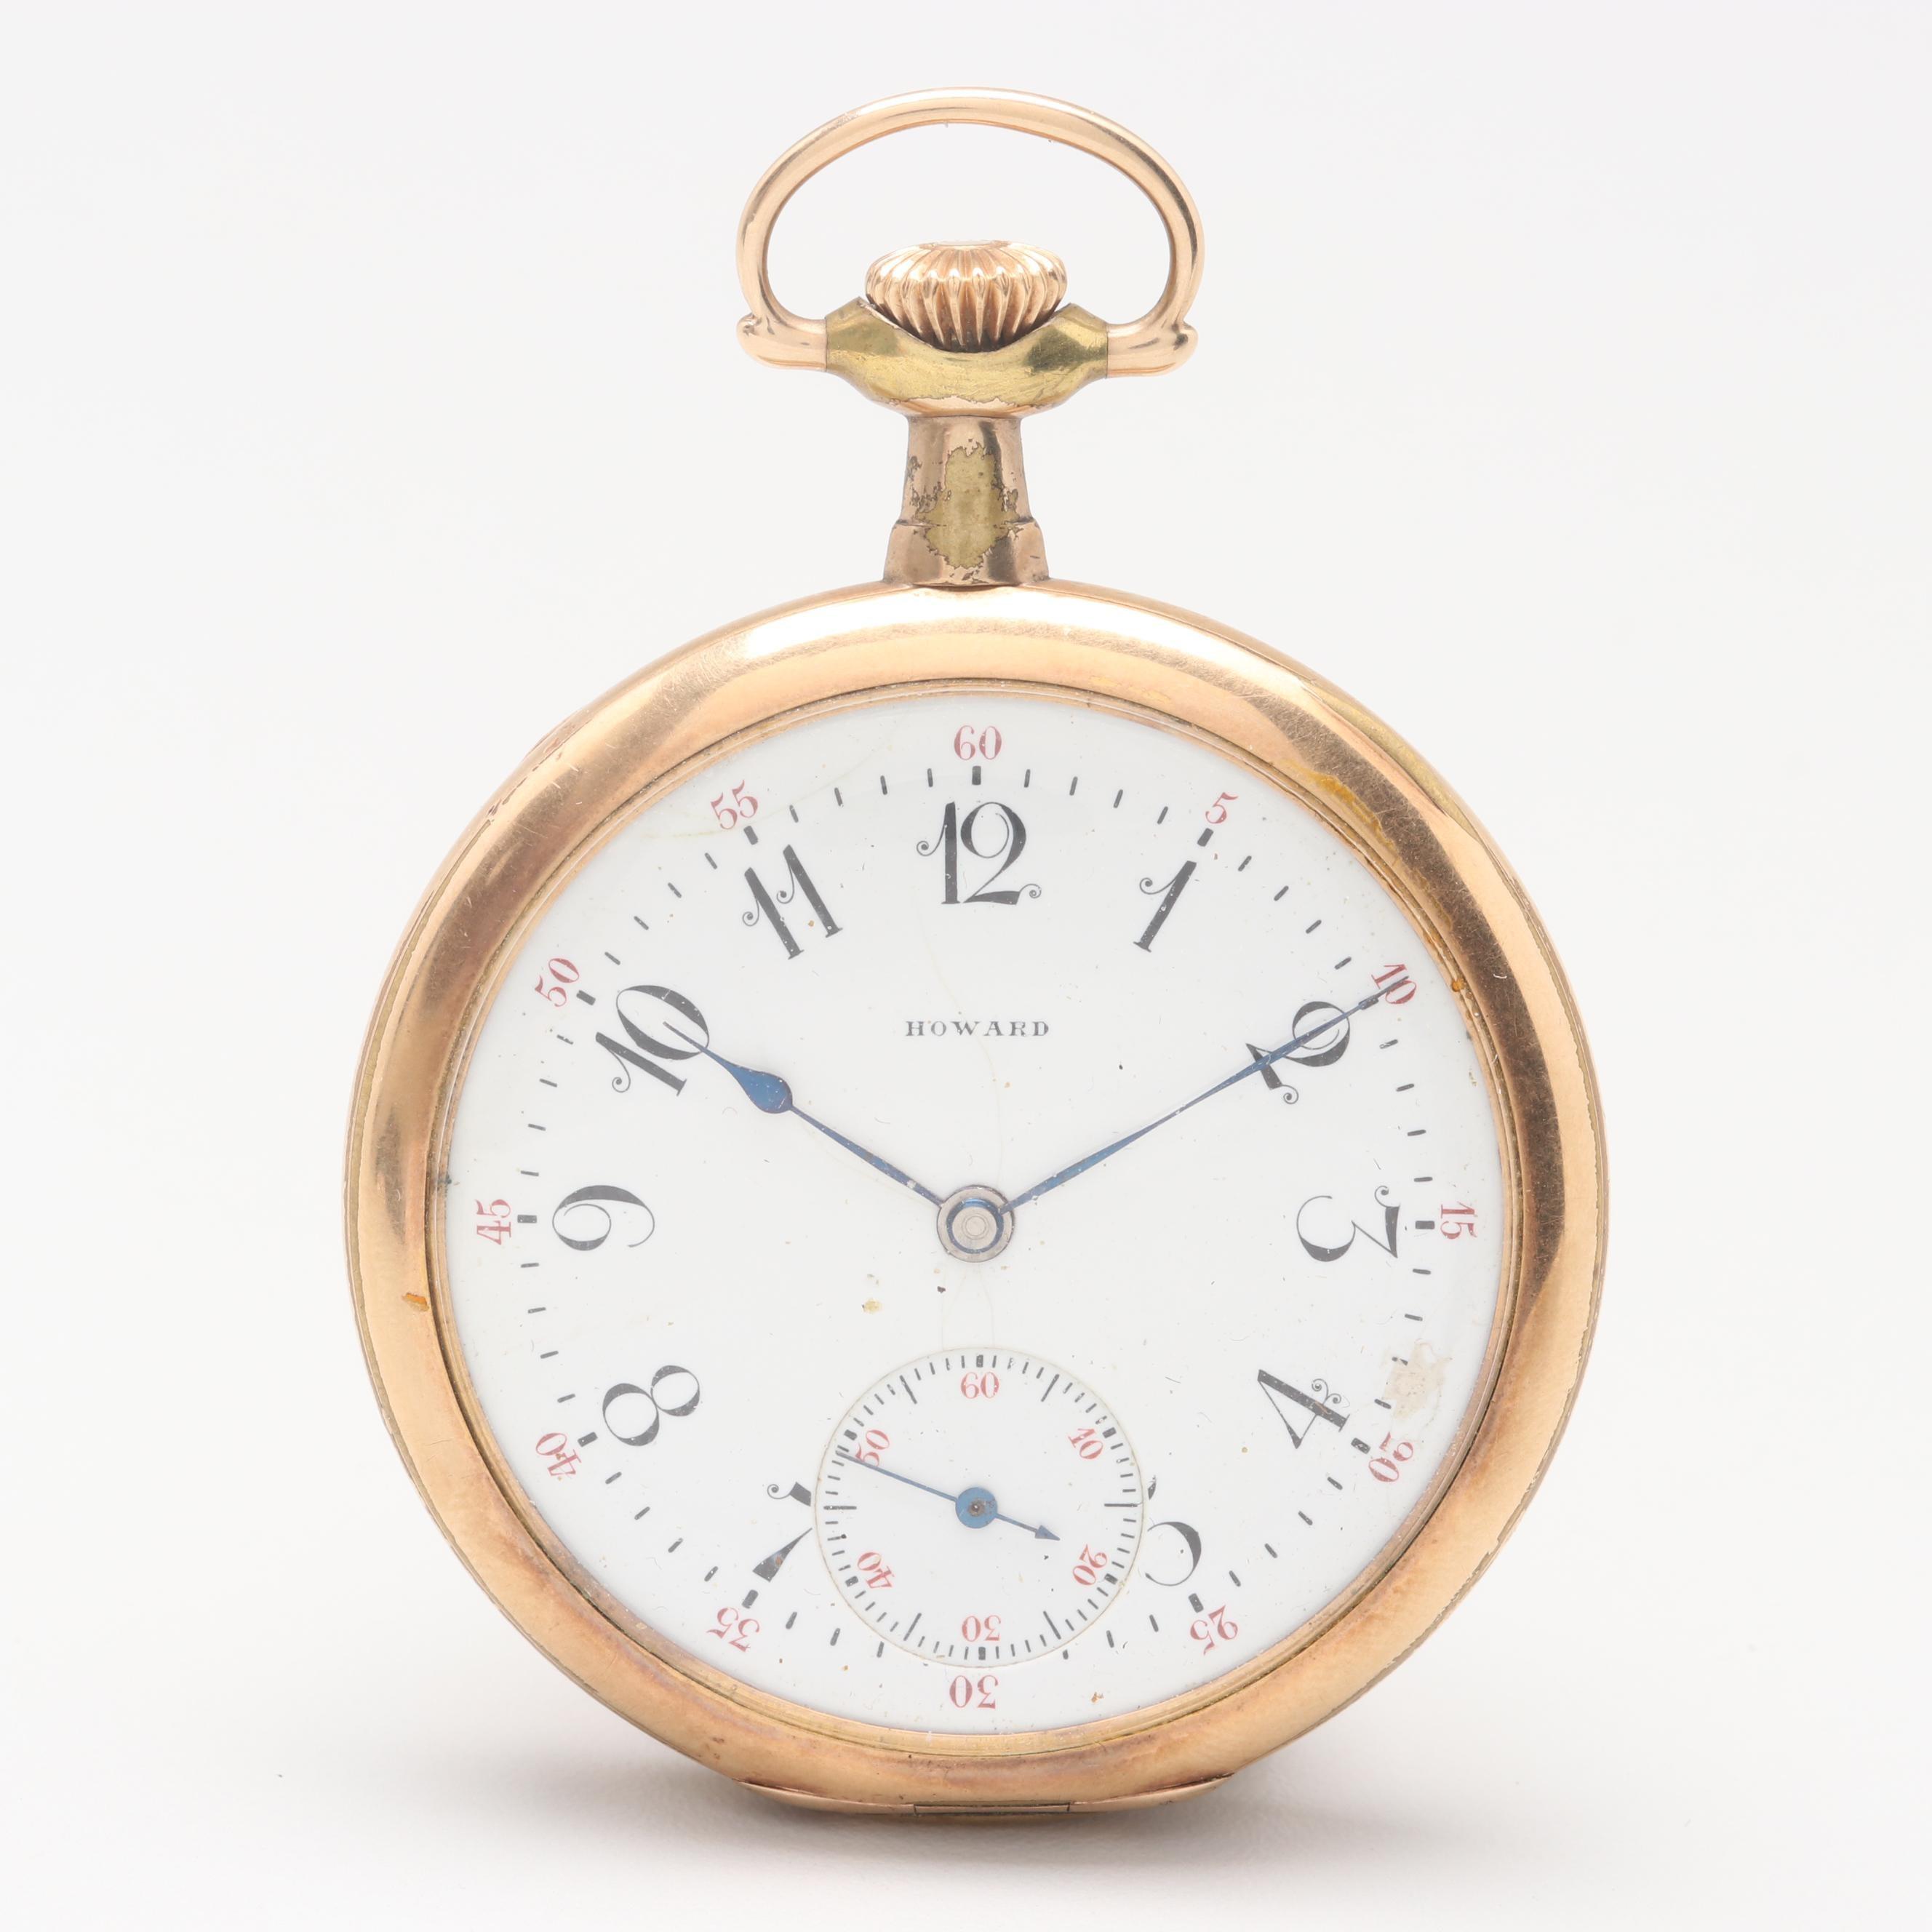 Circa 1909 Howard Gold Filled Open Face Pocket Watch